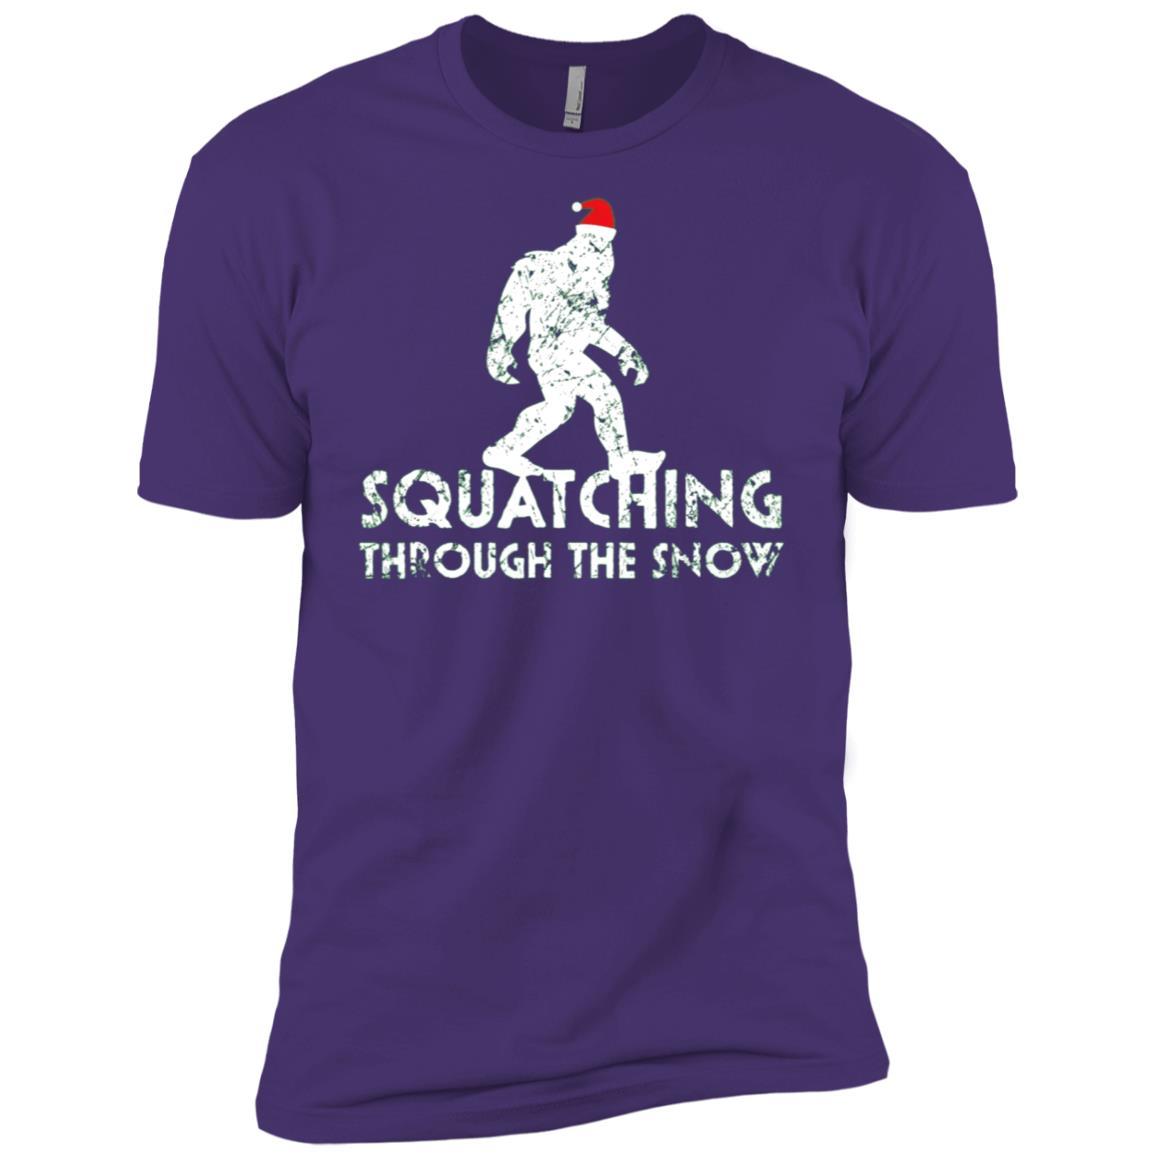 Squatching Through The Snow, Funny Bigfoot Christmas Men Short Sleeve T-Shirt